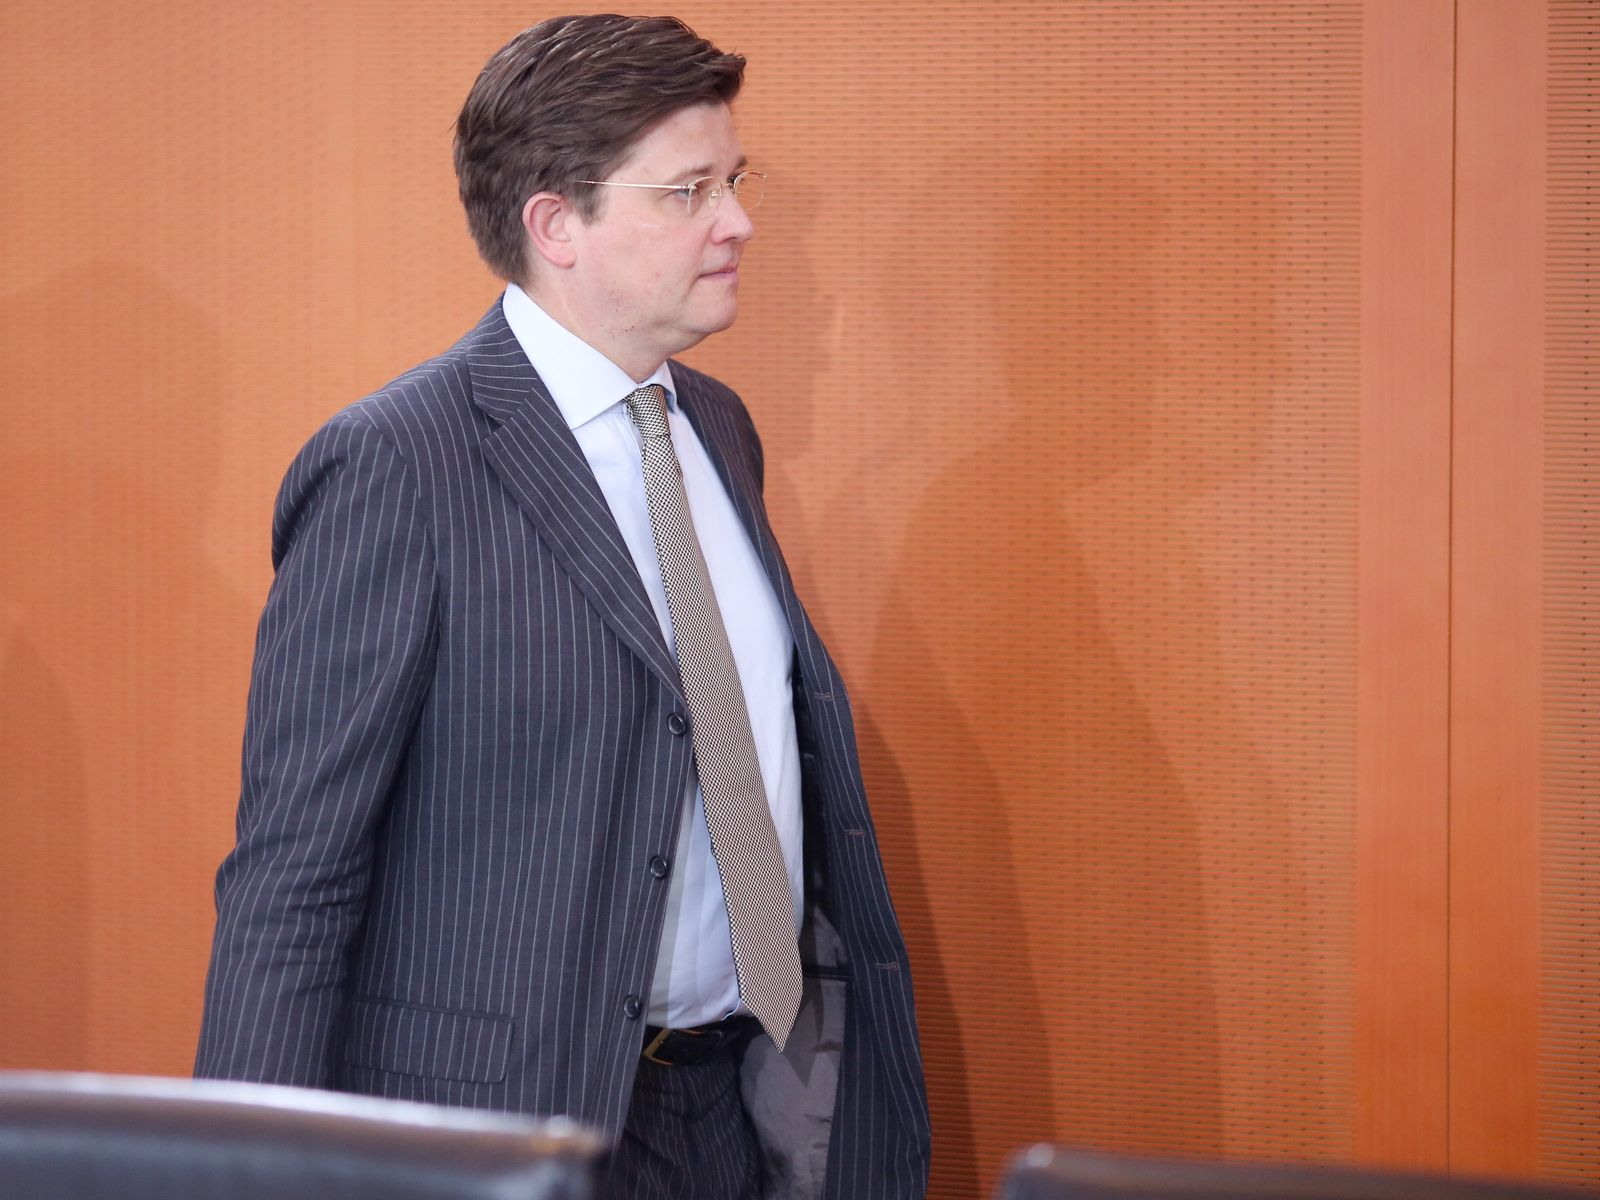 Eckart von Klaeden/ Bundeskabinett